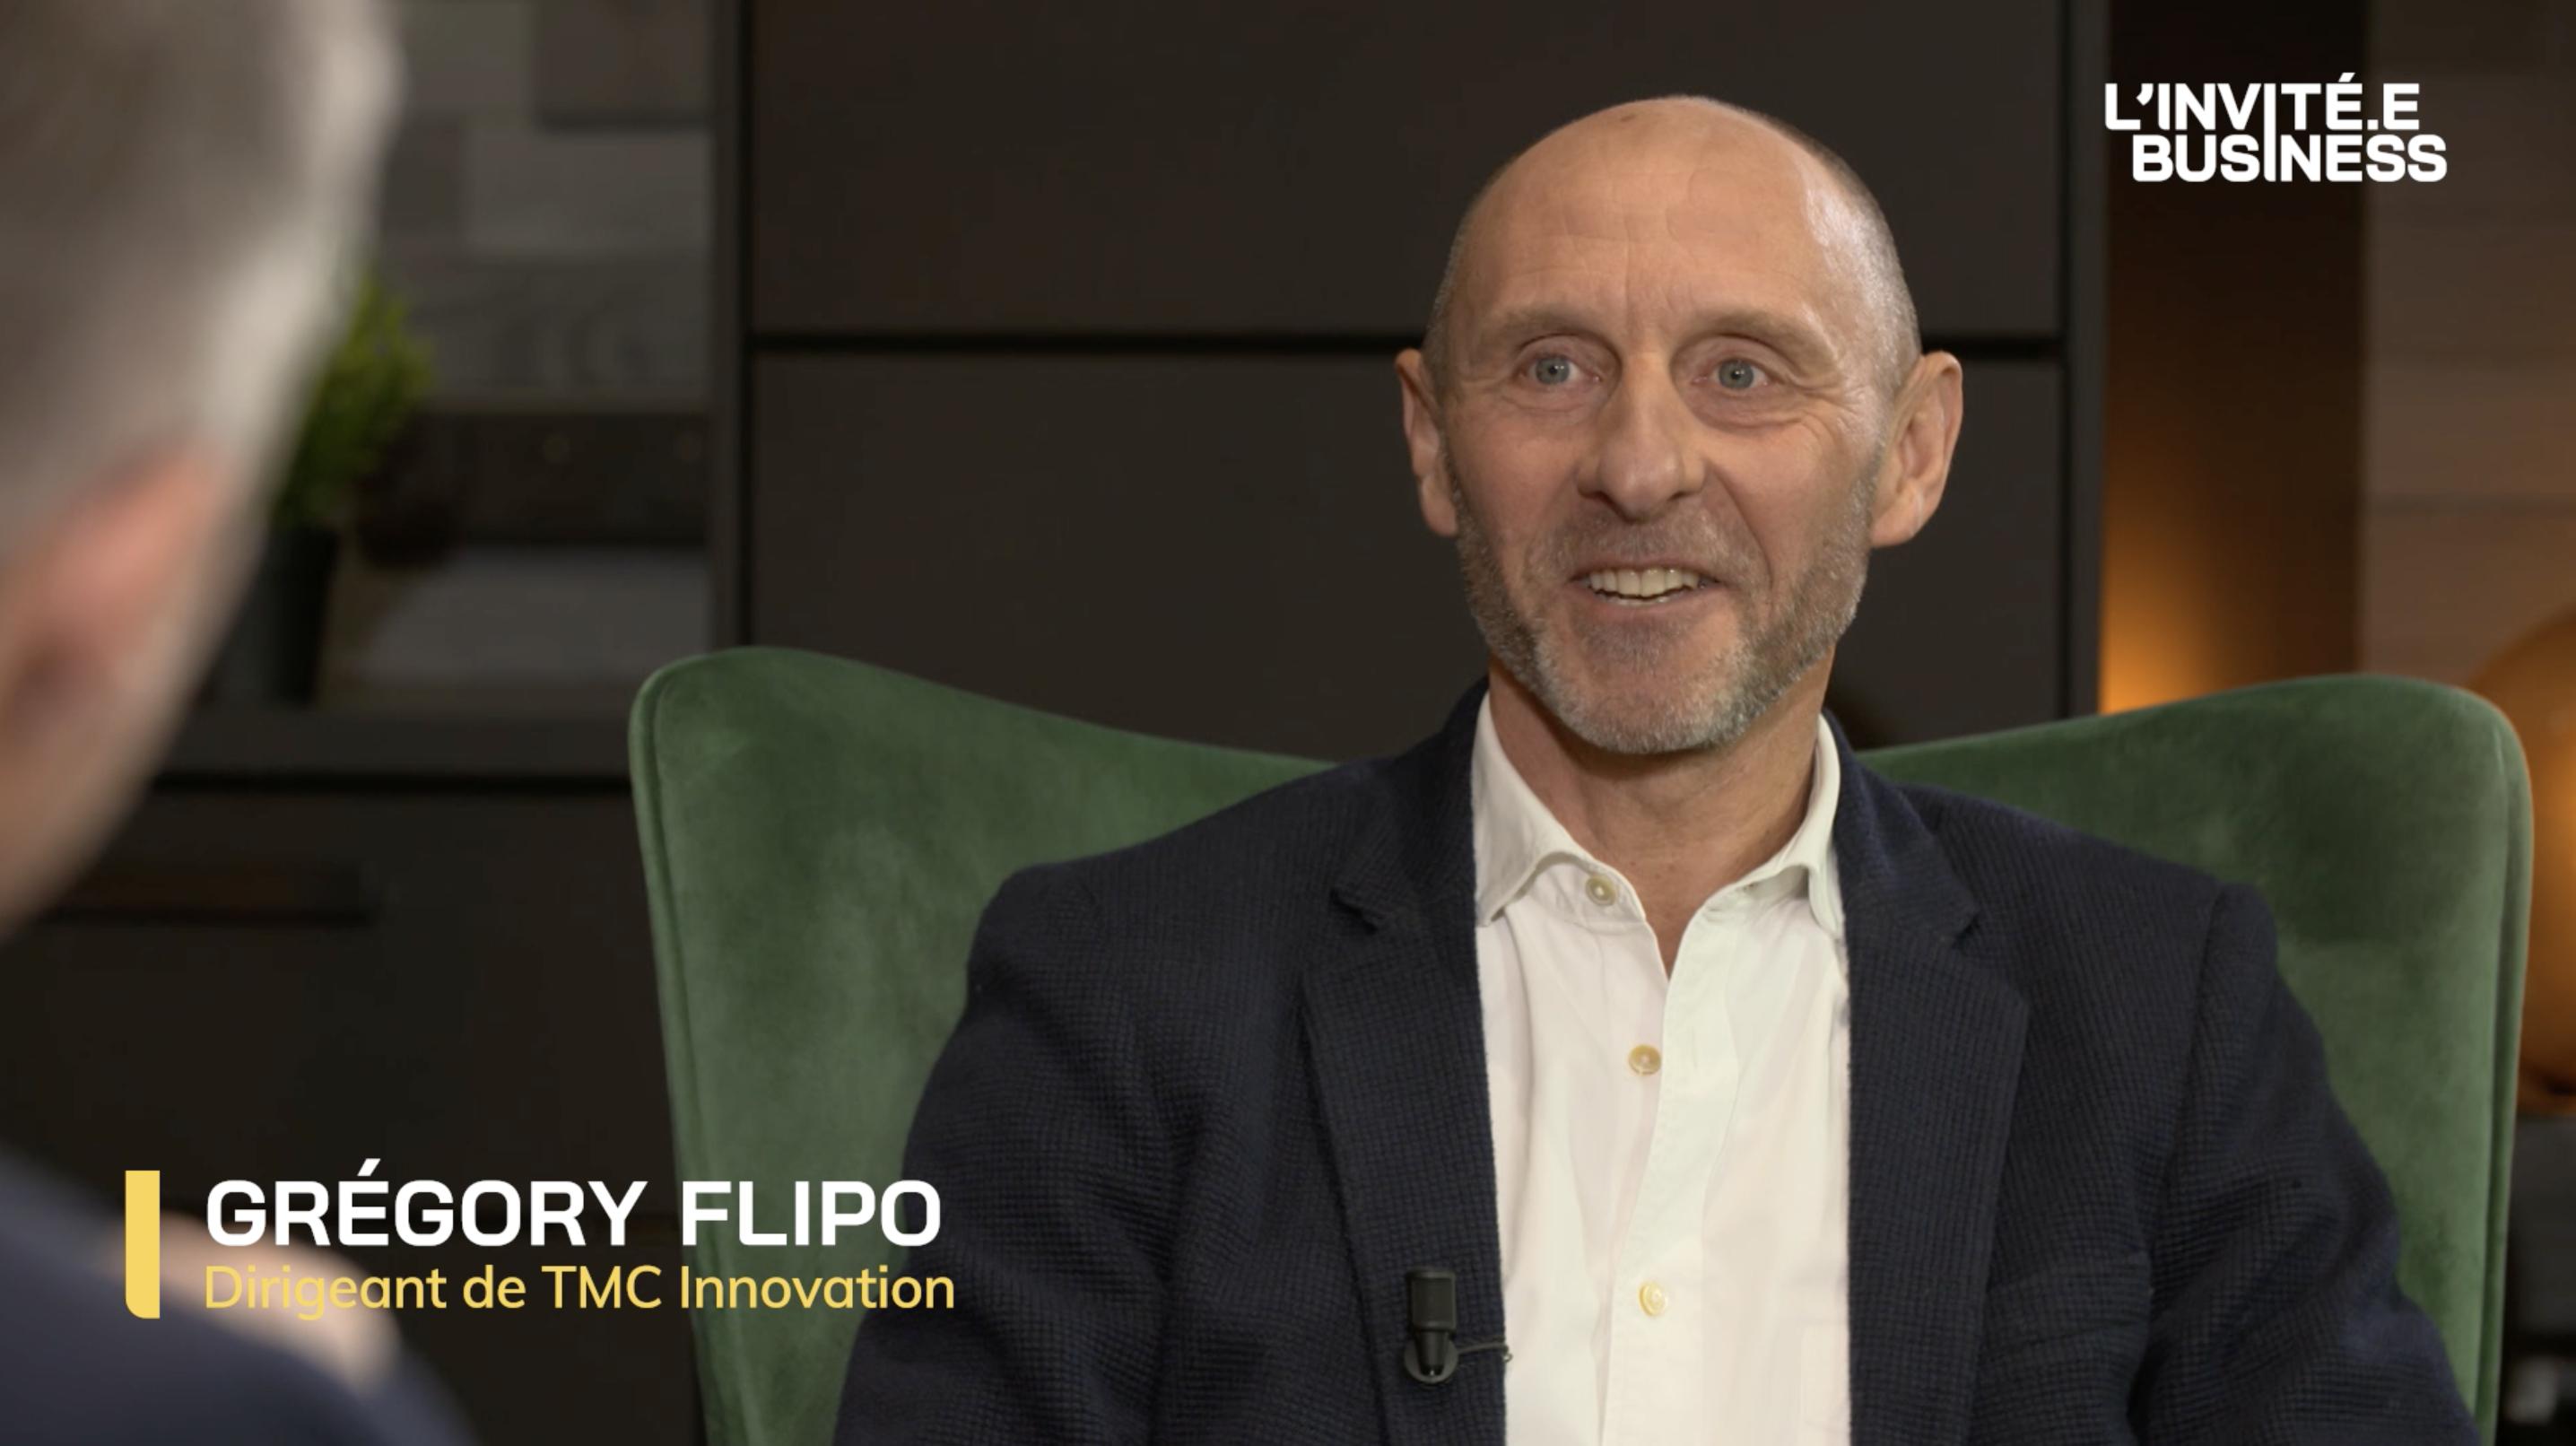 Gregory Flipo, Dirigeant de TMC Innovation